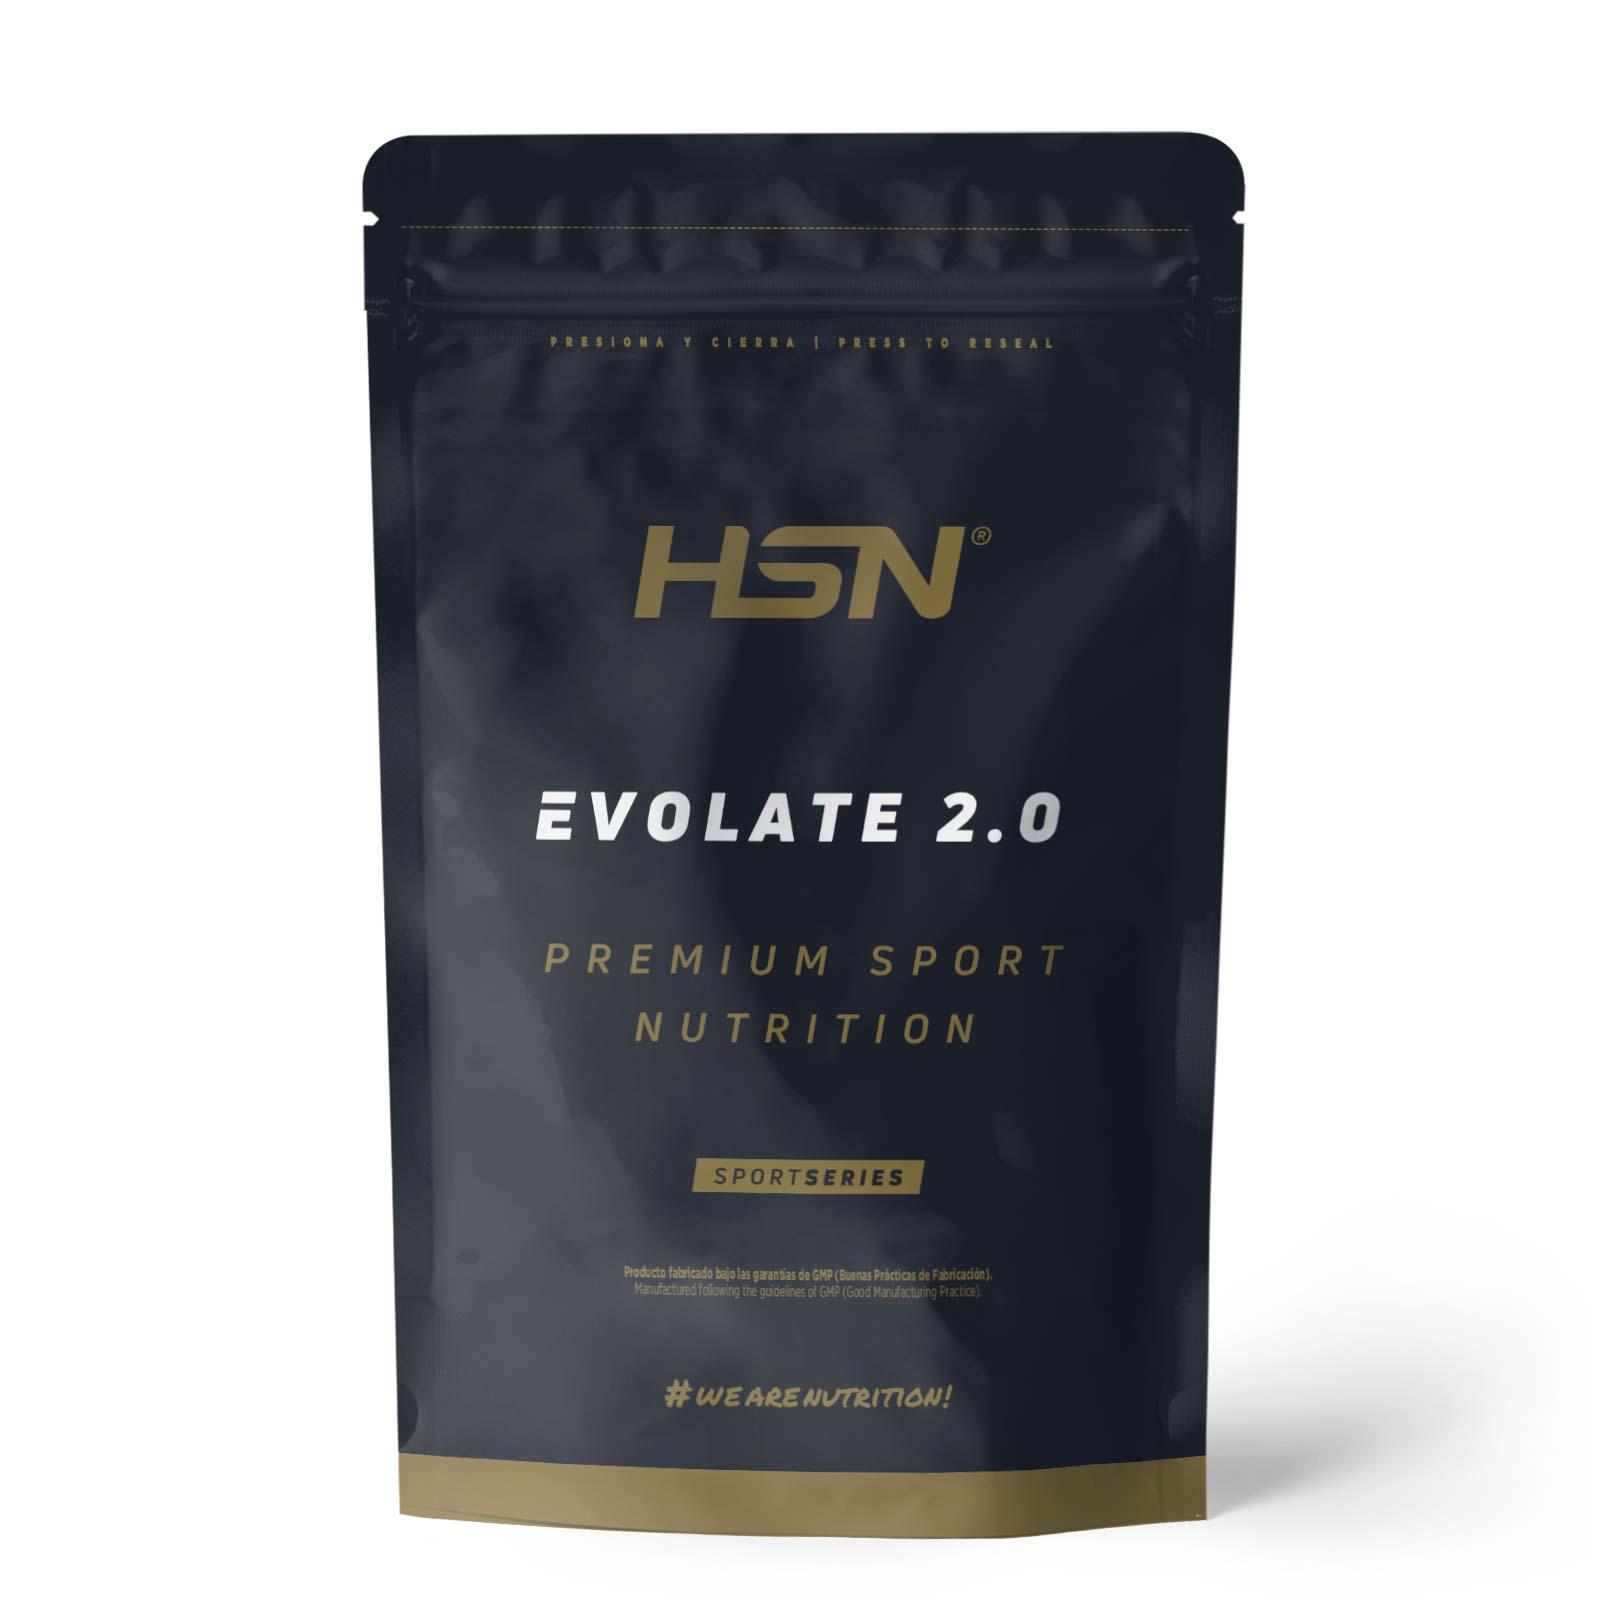 Evolate 2.0 HSN Sports